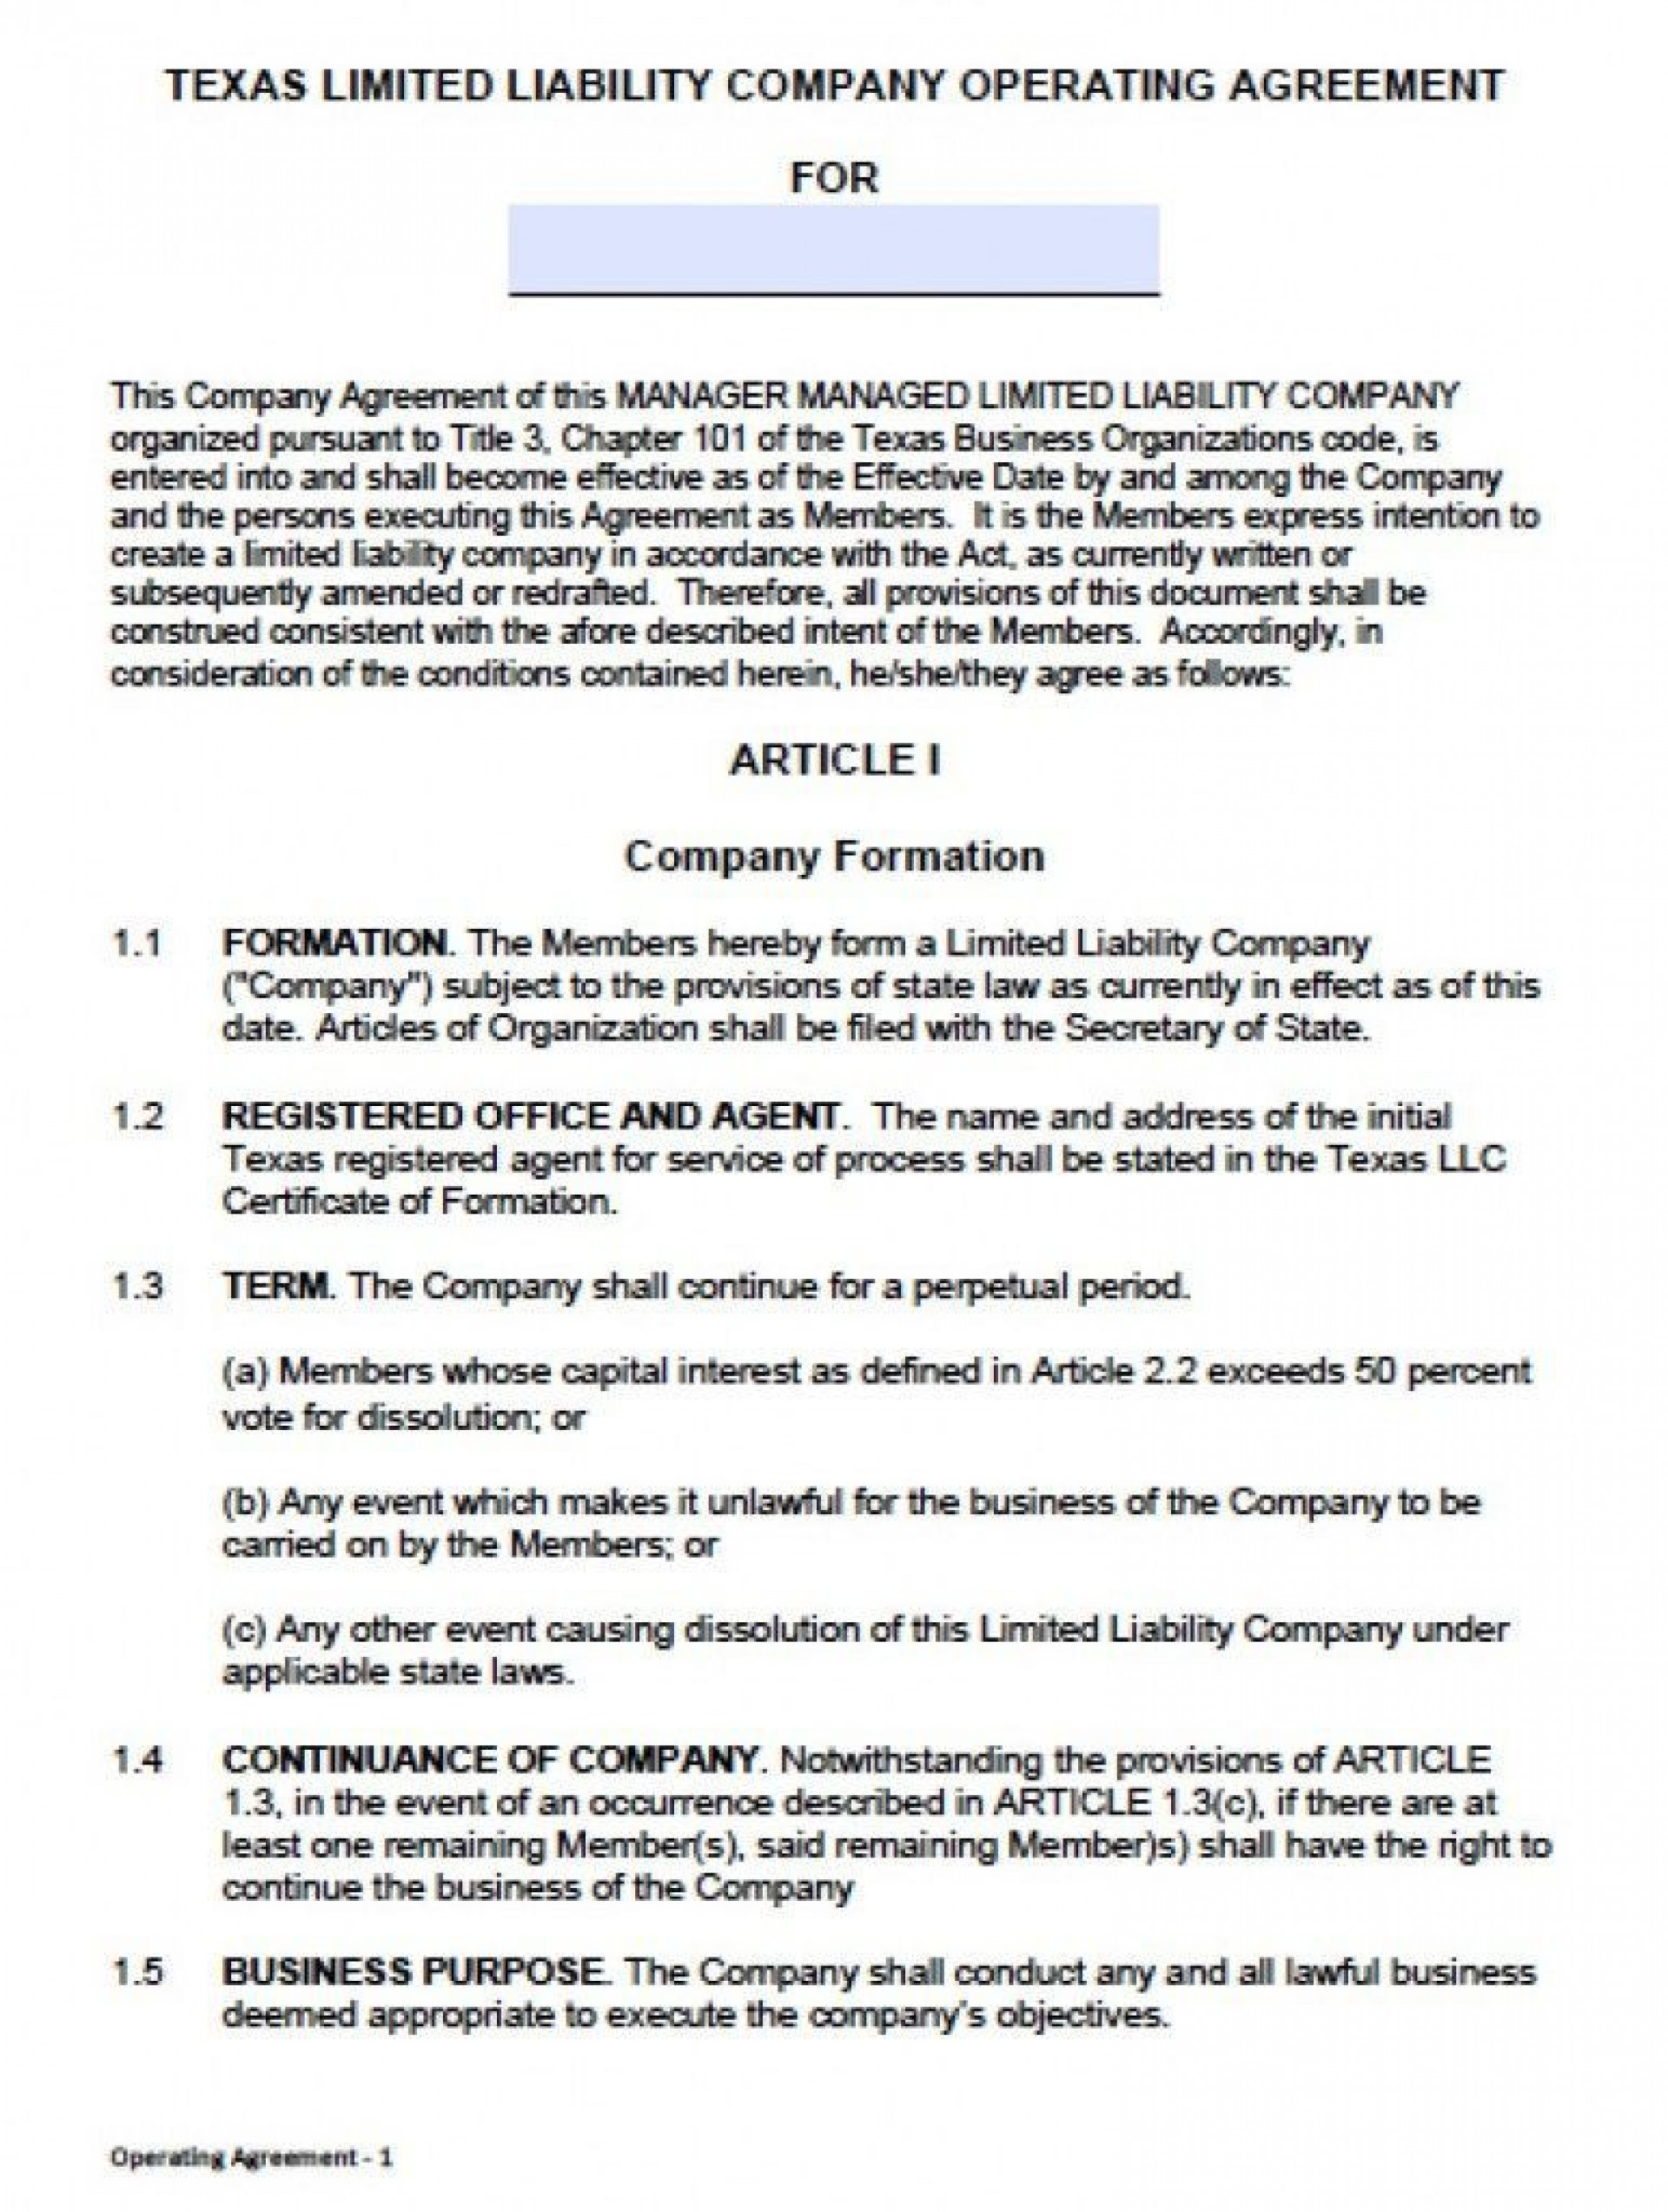 000 Wondrou Operating Agreement Template For Llc Inspiration  Form Florida Texa1920